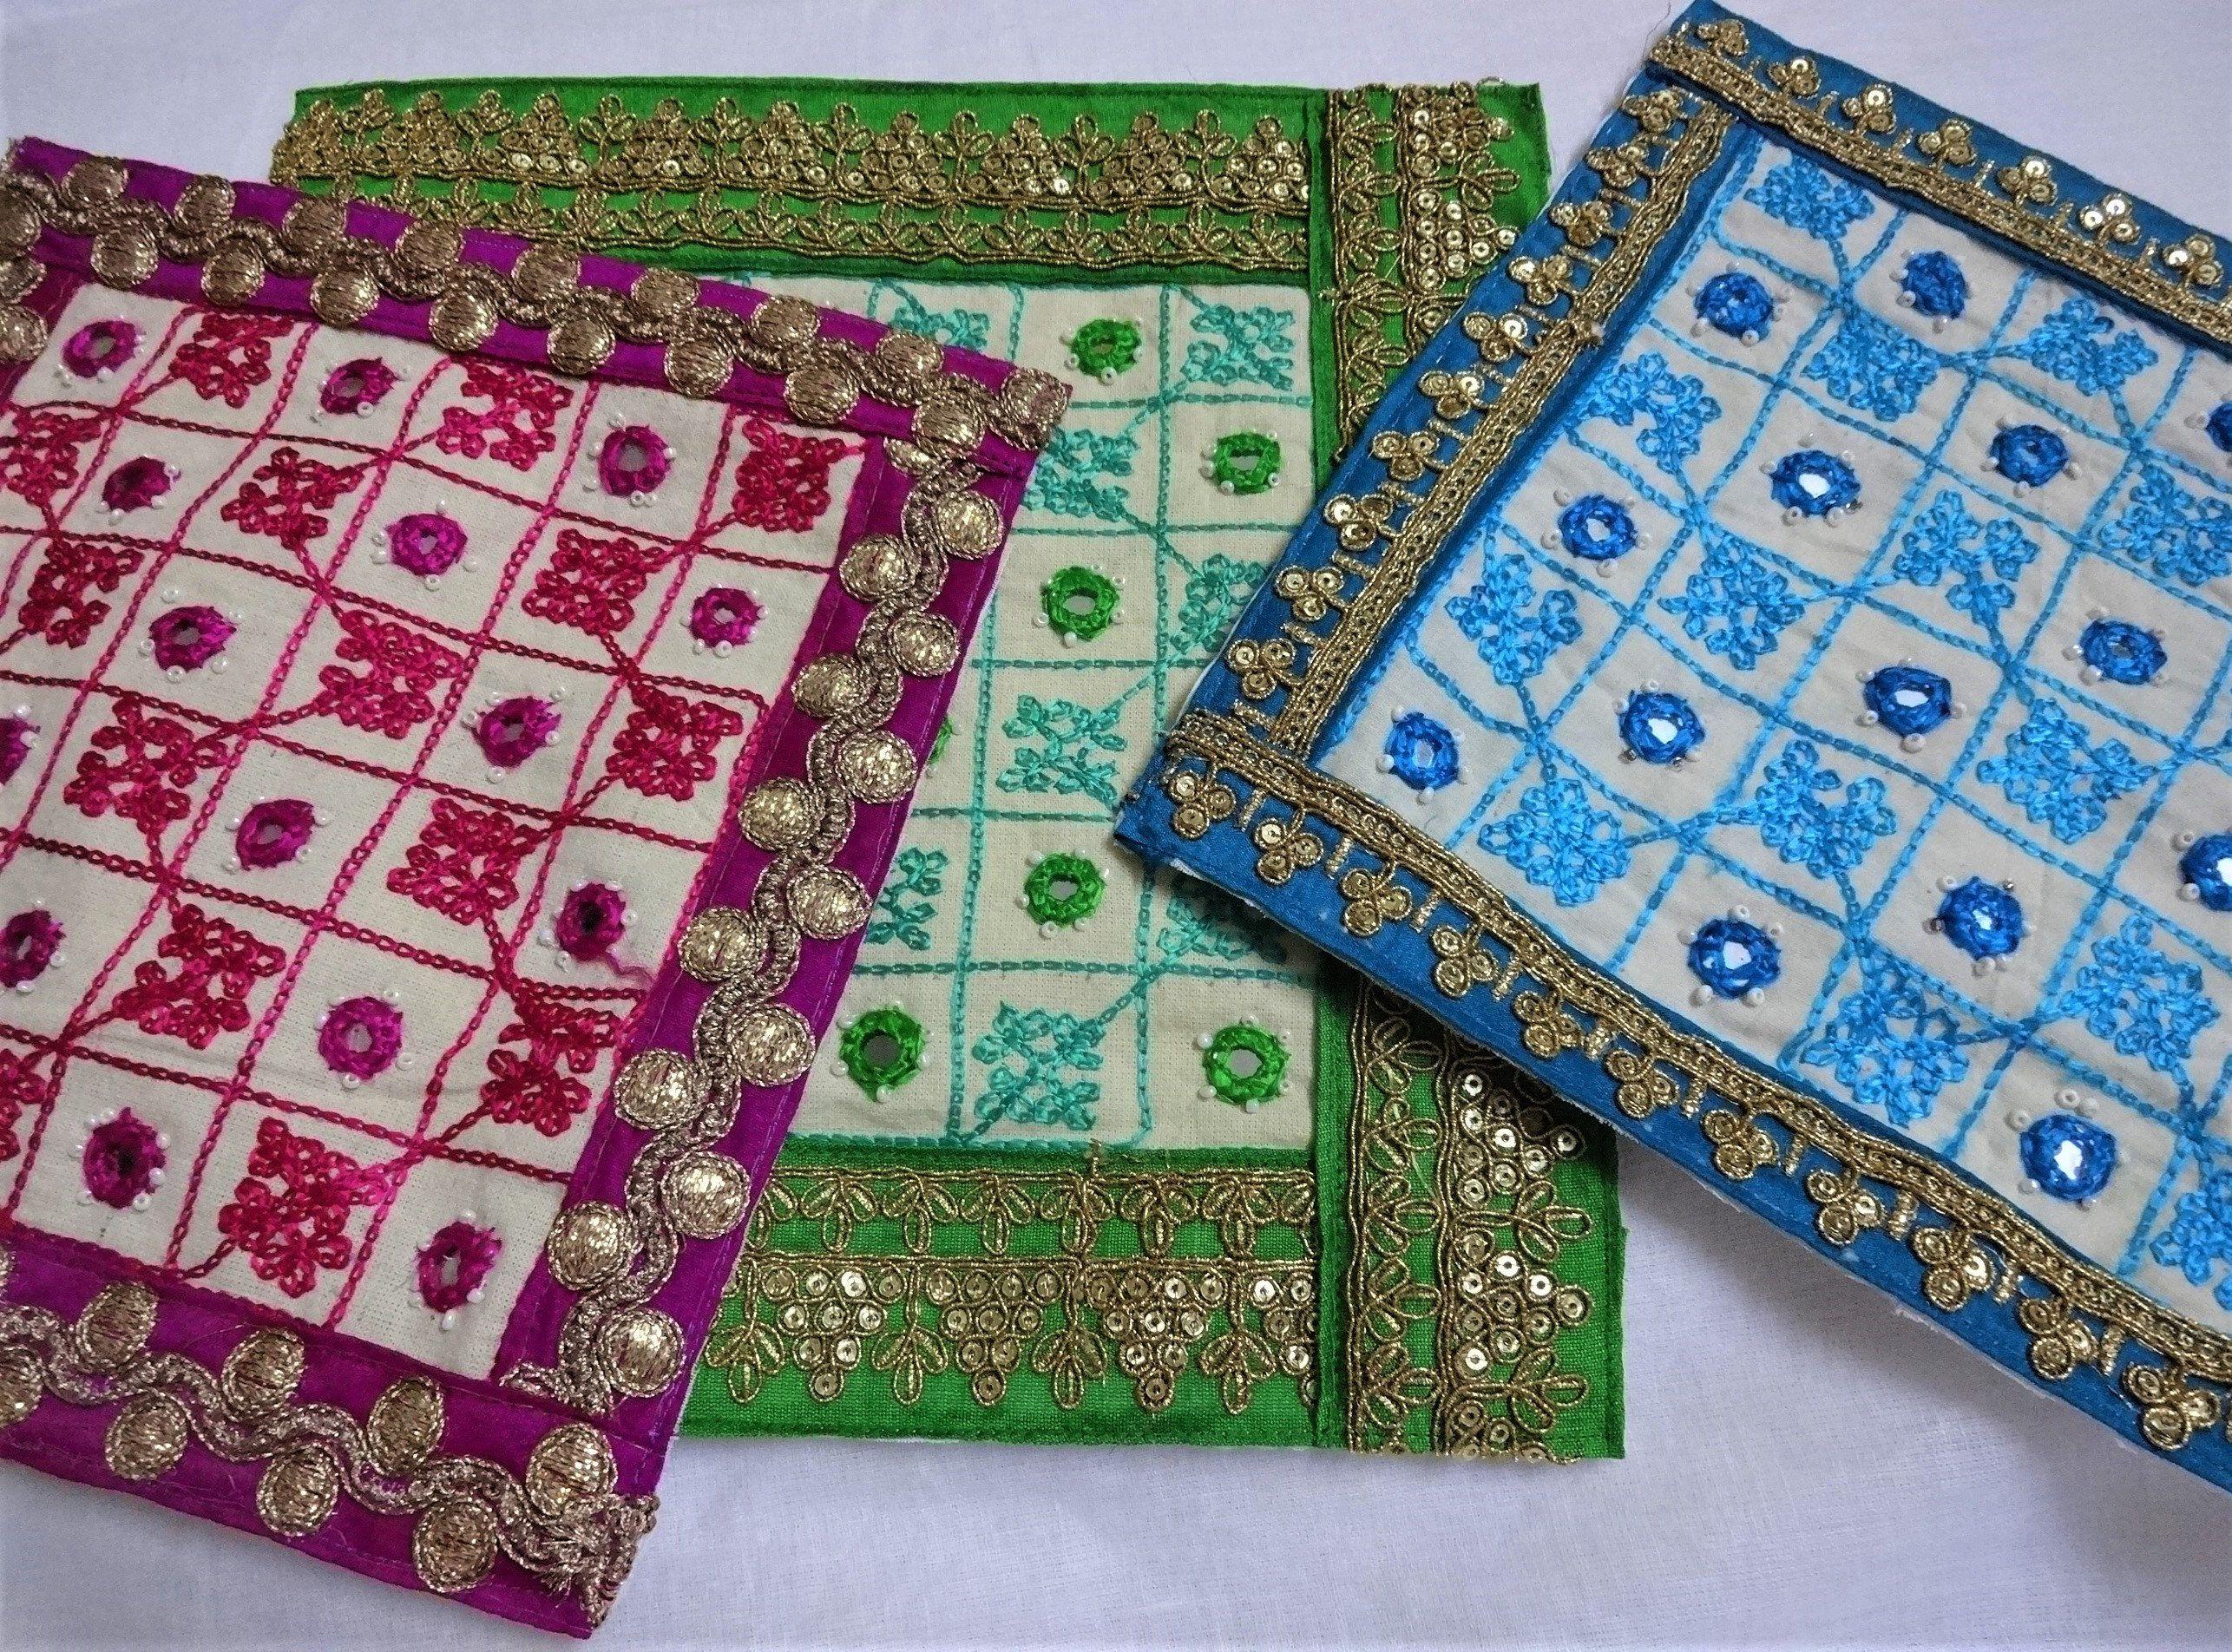 Blue Hand-Embroidered Tribal Trim Kutch India Mirror Banjara Fabric Embroidery